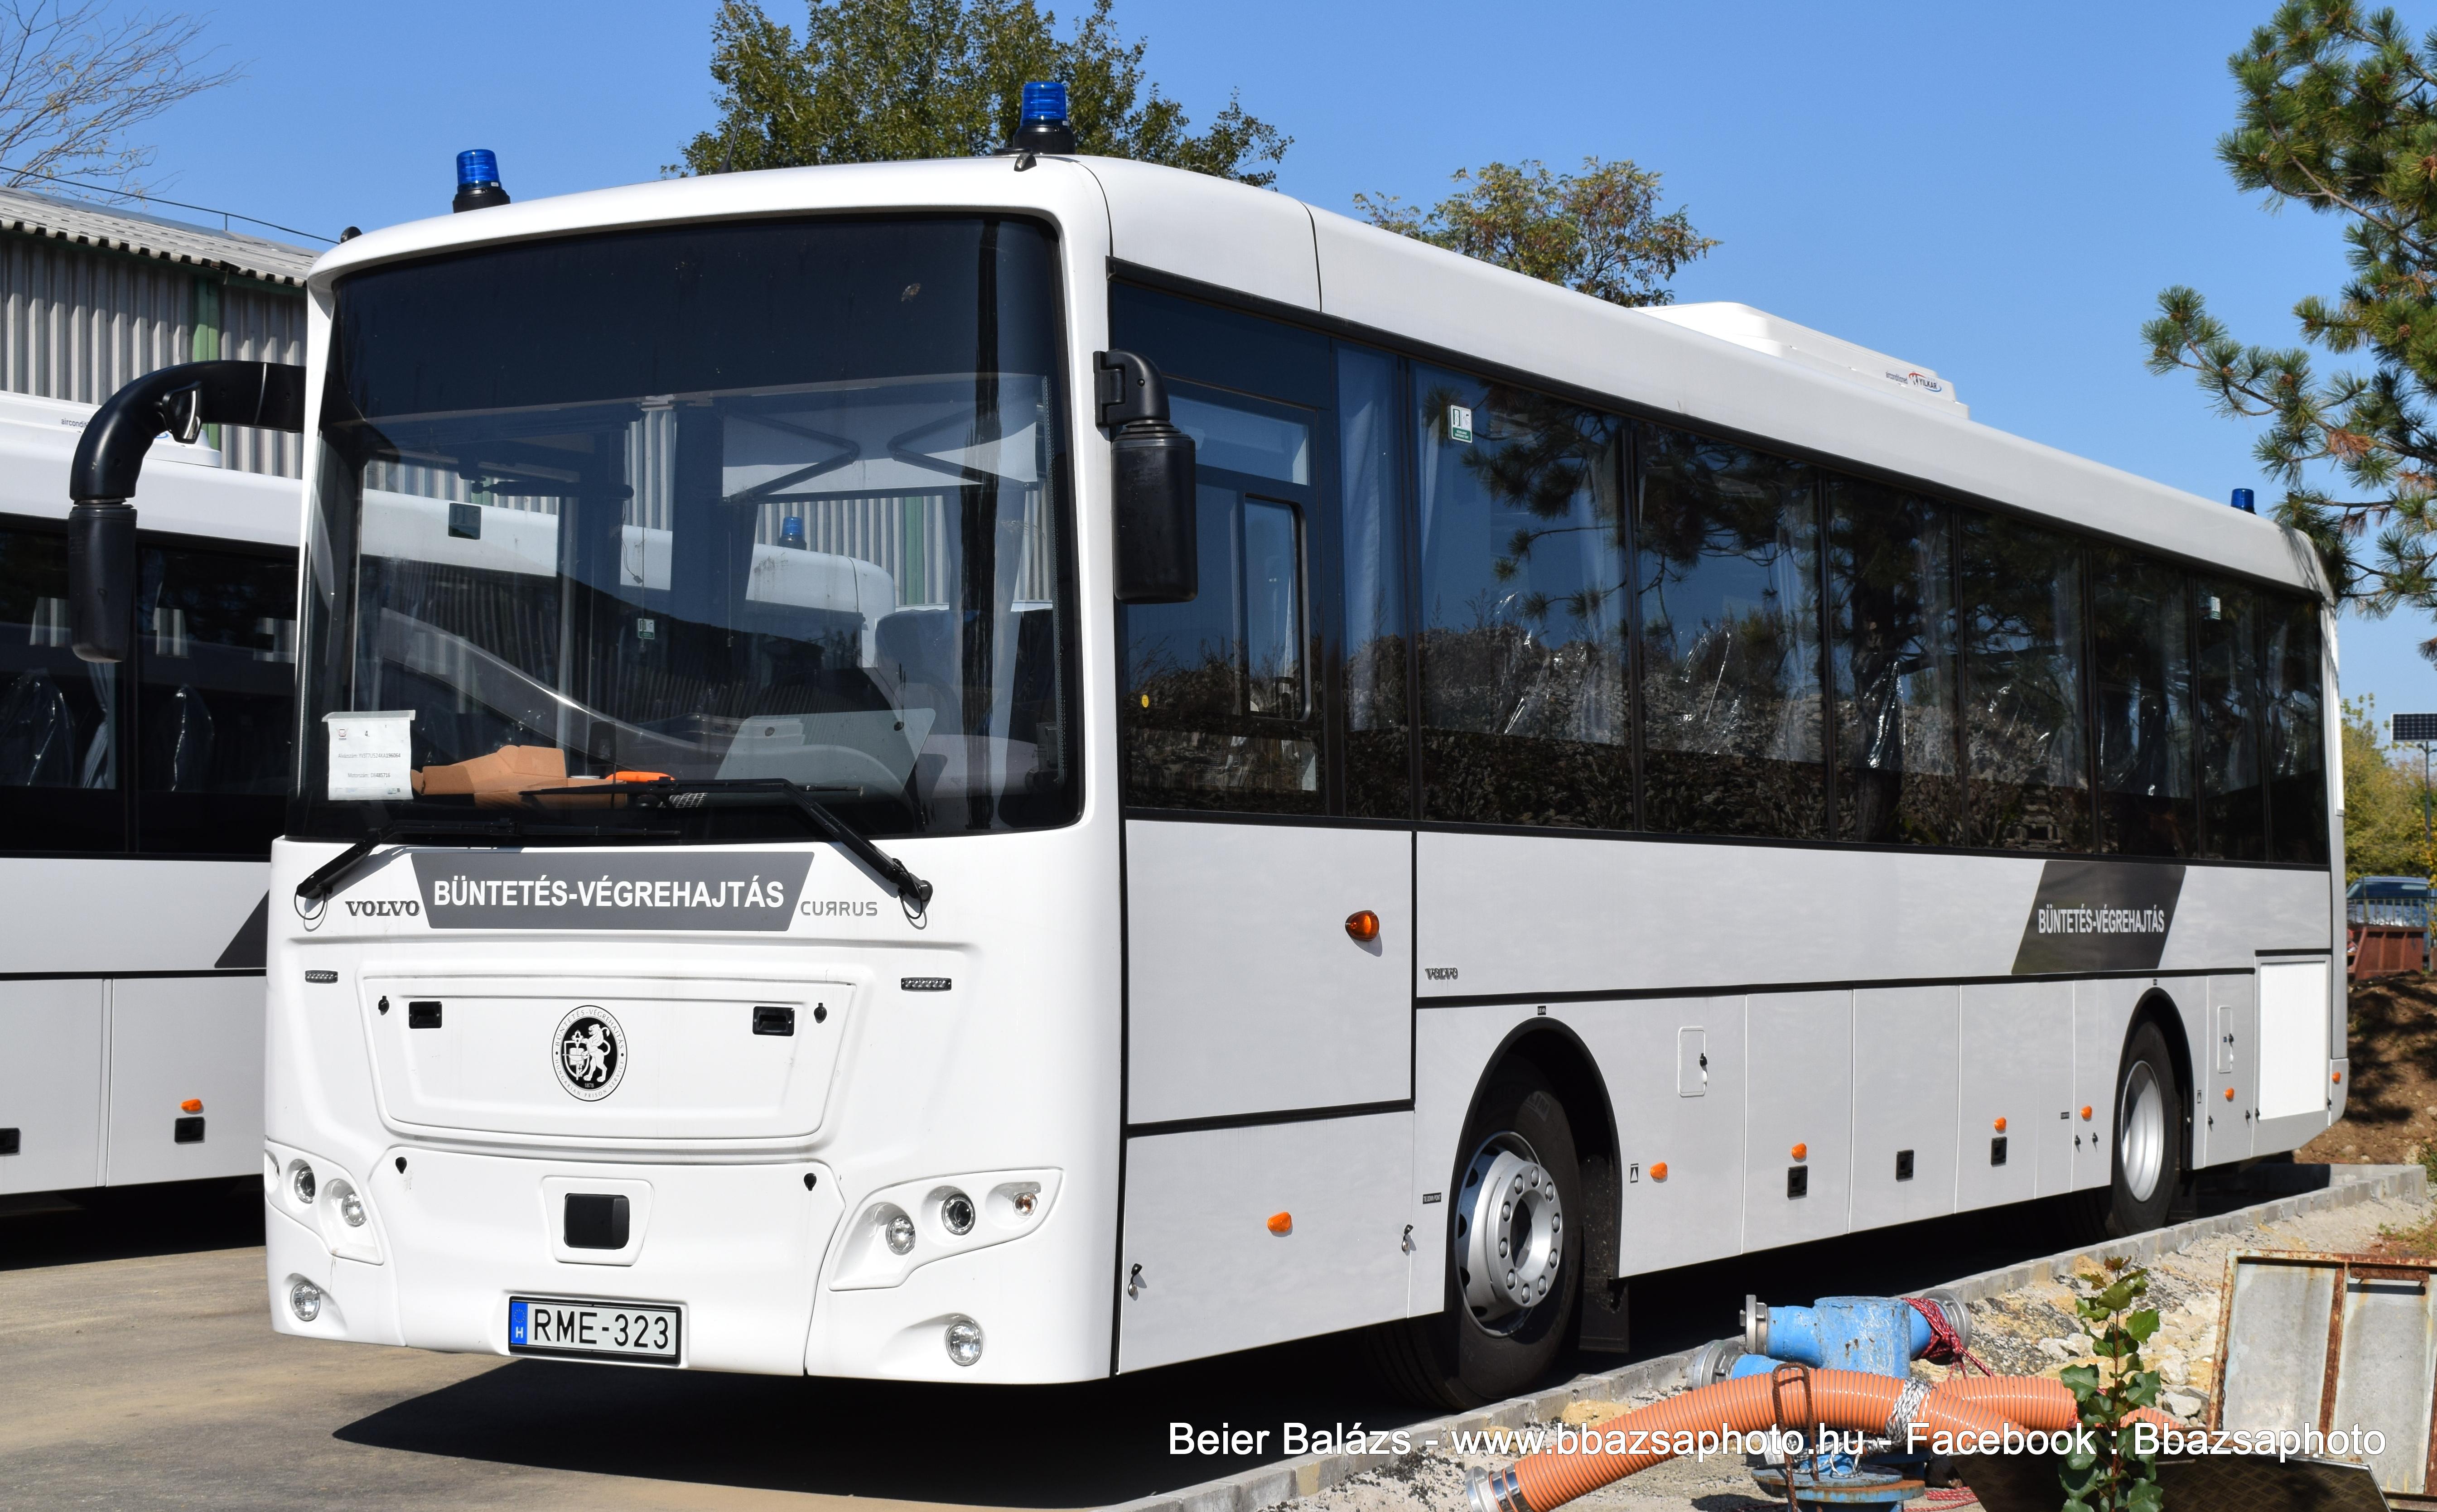 Volvo Currus Aries – BV – csapat